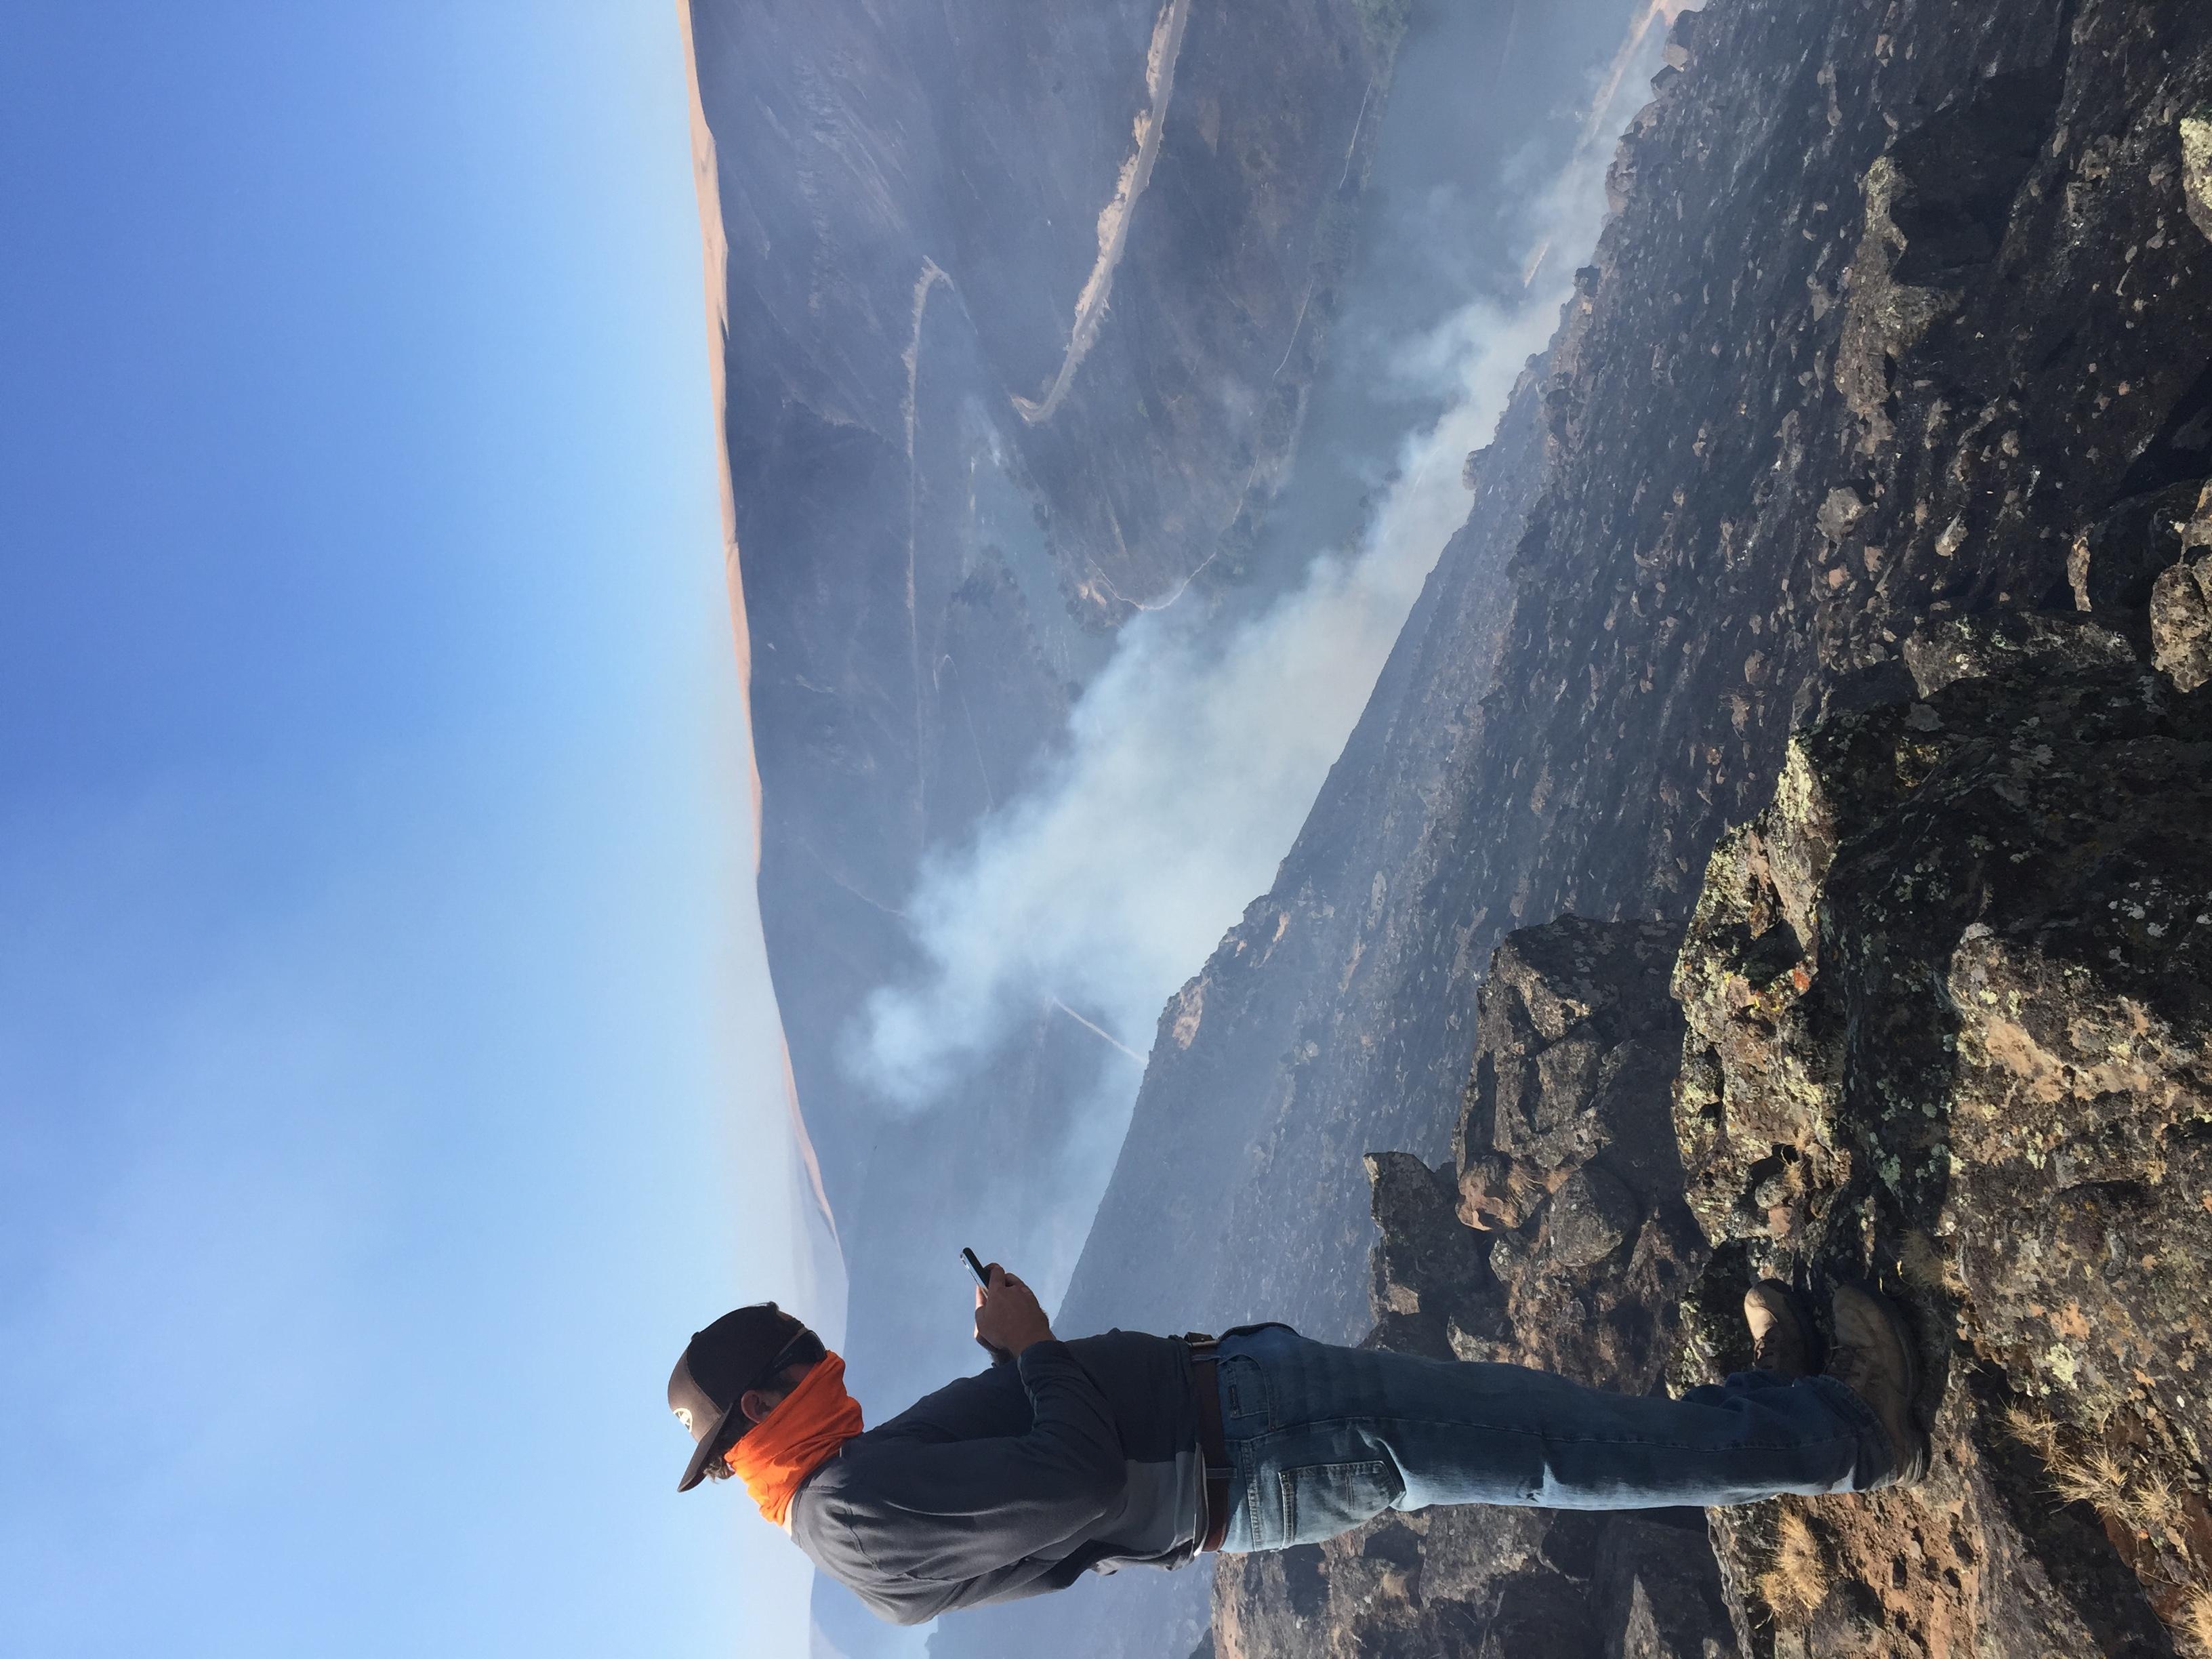 Evan at Substation fire 2018